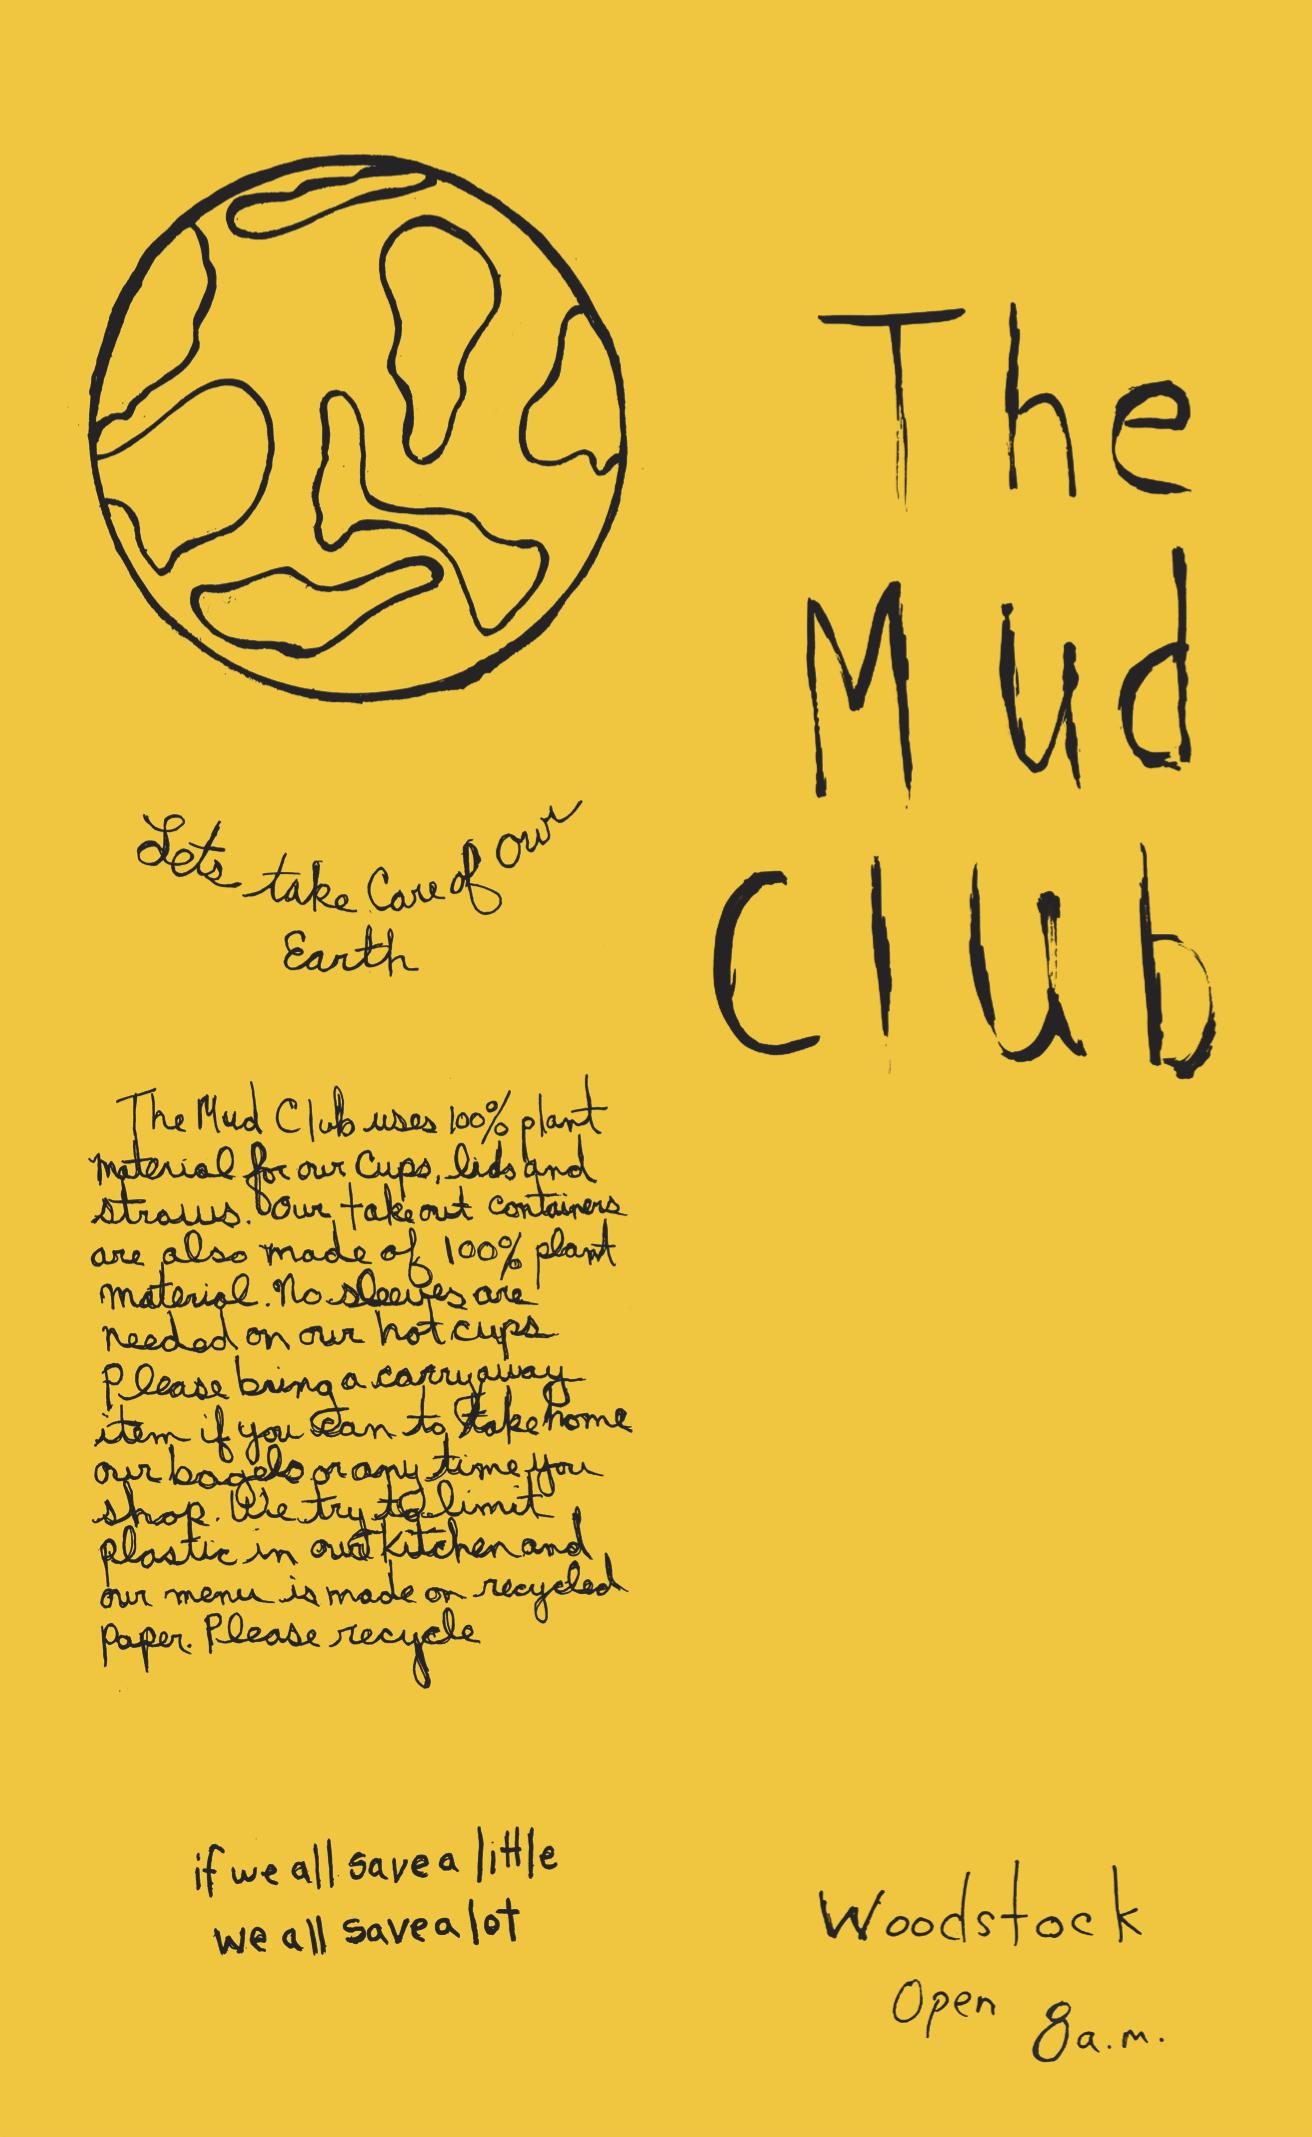 Mud Club 8.5x14 Menu outter.jpg